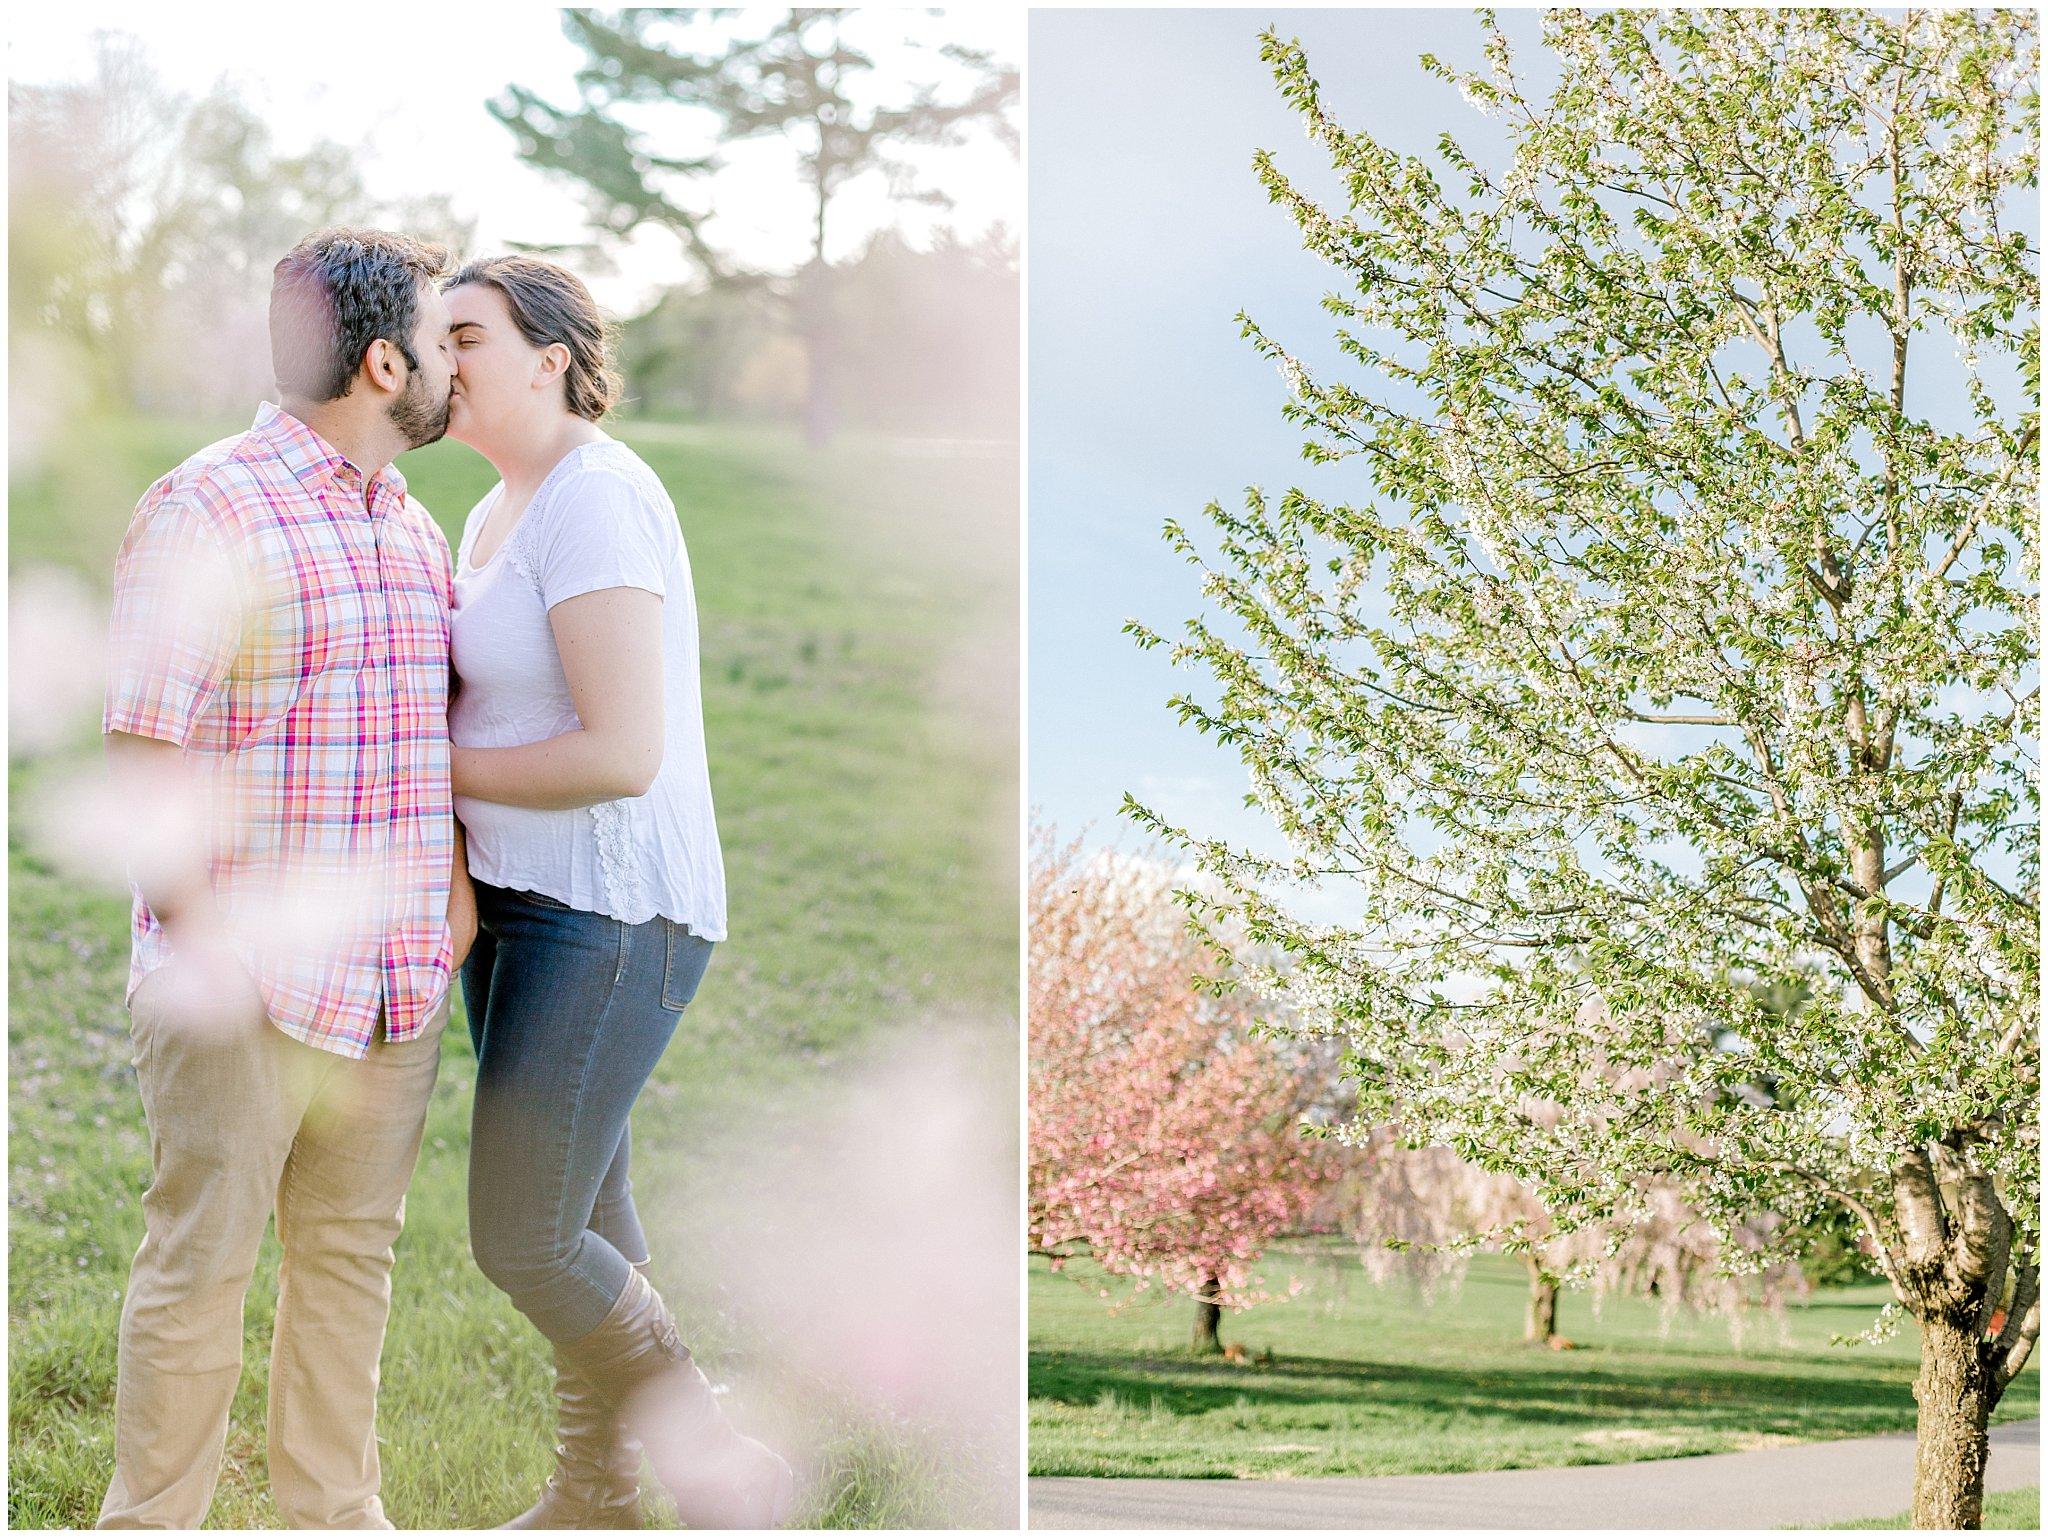 Lehigh Valley Spring Cherry Blossom Engagement Session Pennsylvania Wedding Photographer (22).jpg